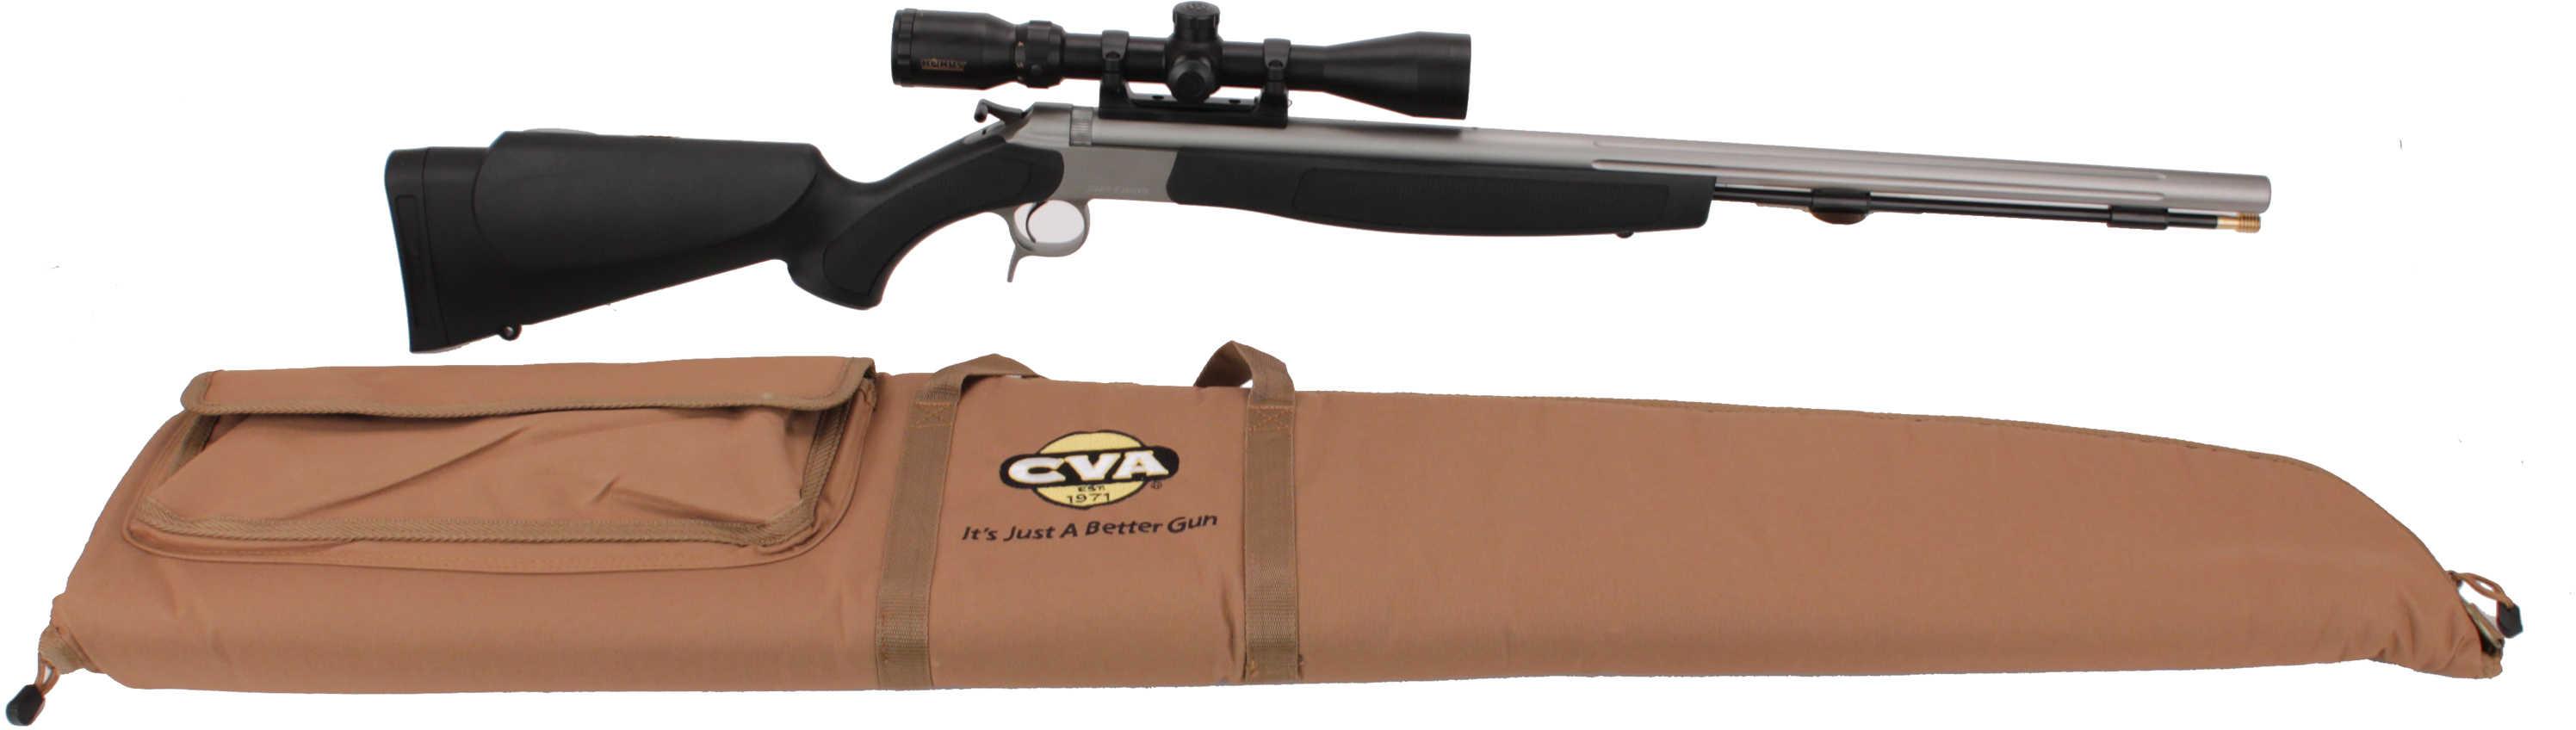 CVA Optima v2 209 Magnum  50 Caliber 26